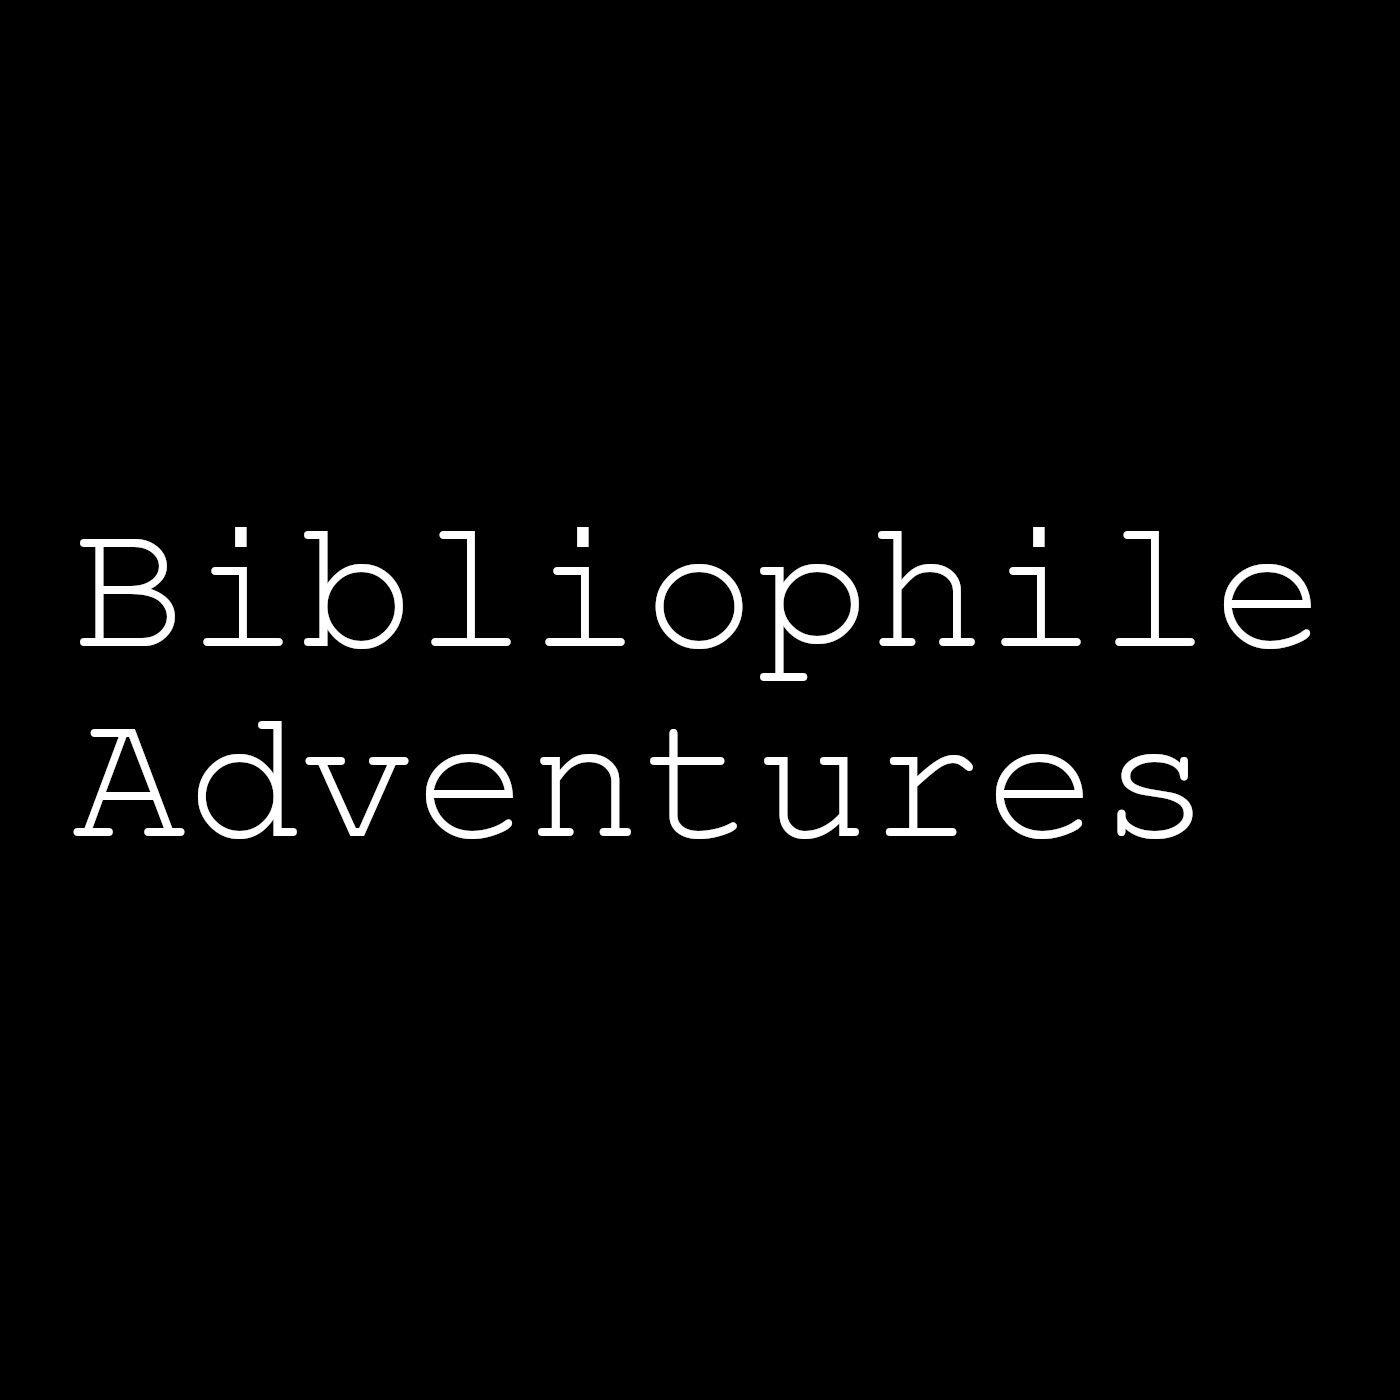 Bibliophile Labyrinth Adventures